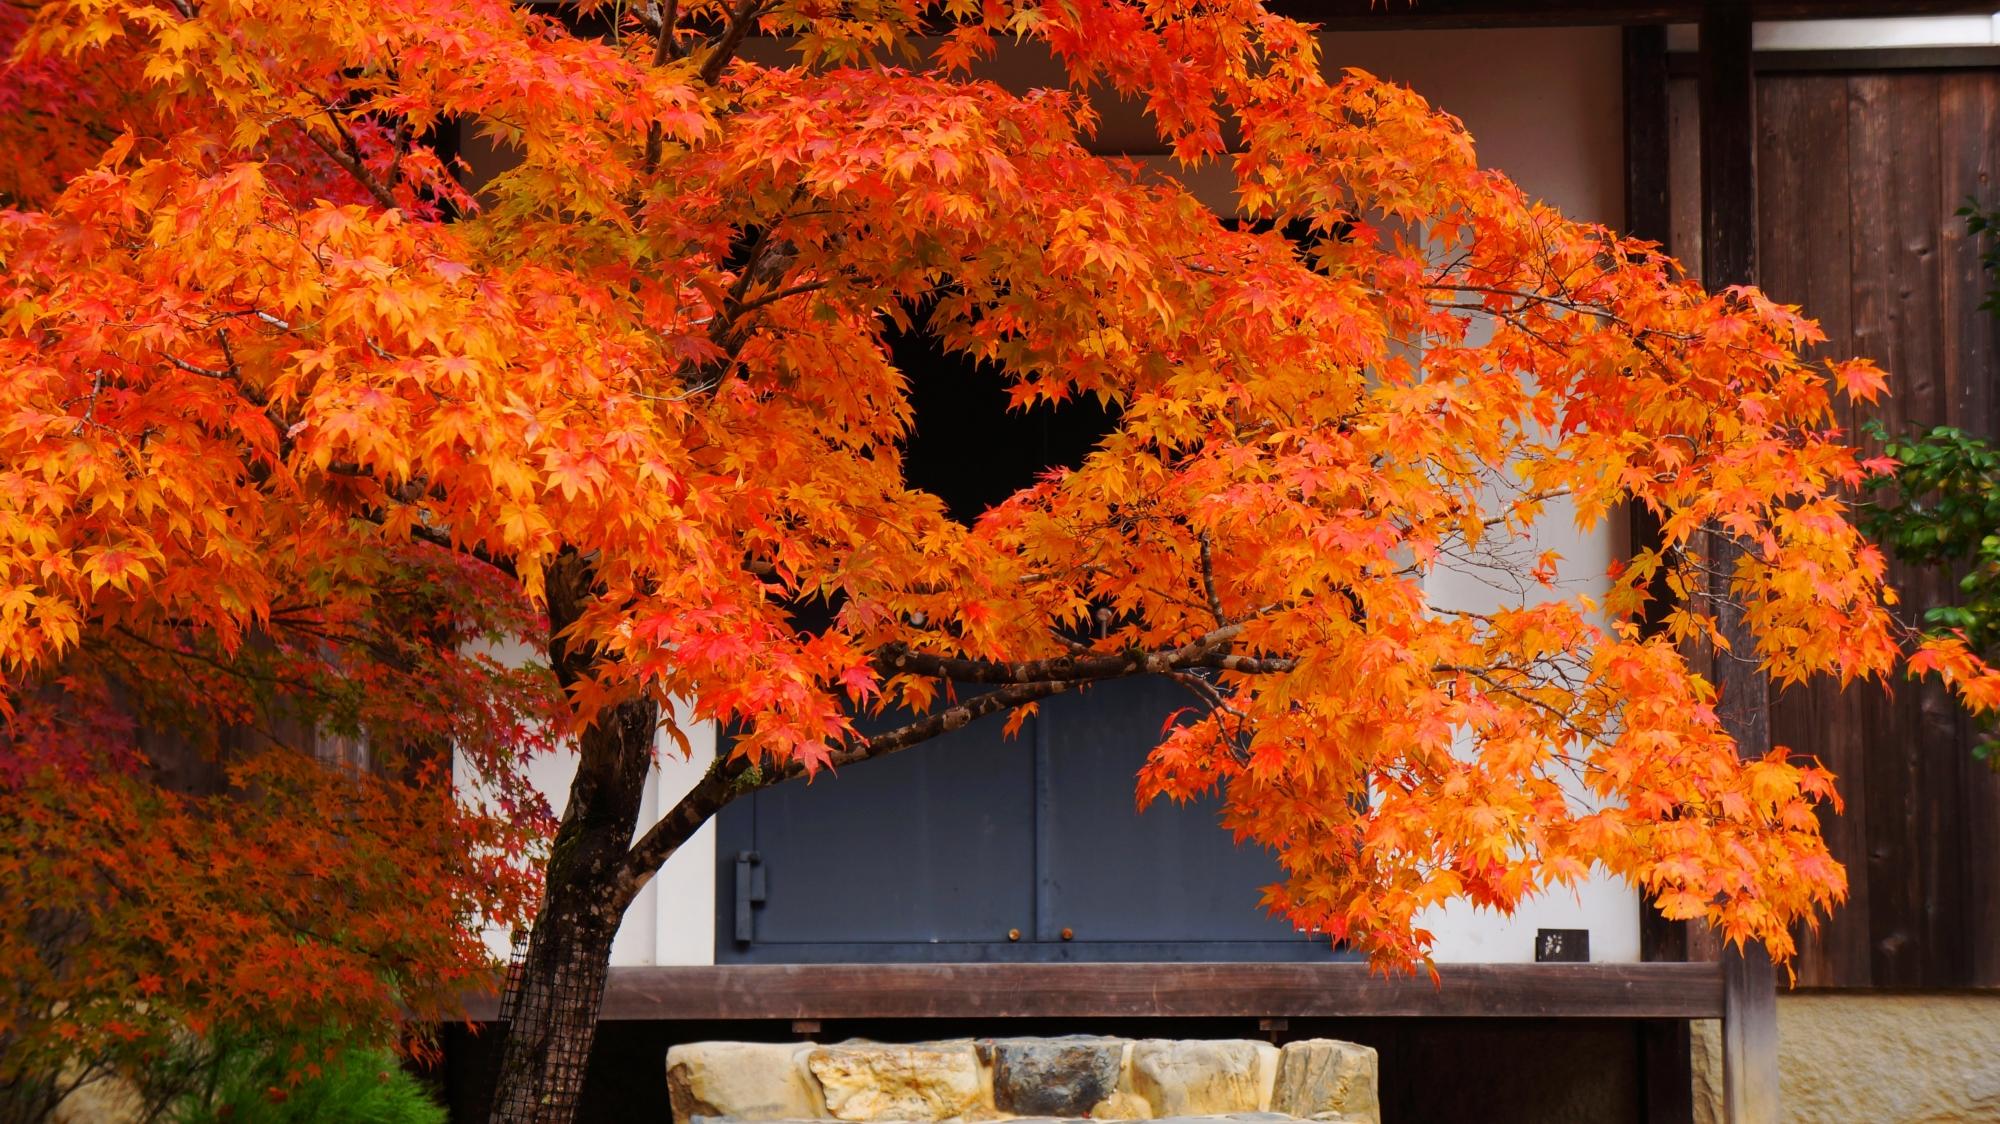 淡く光るような色合いの見事な発色の紅葉